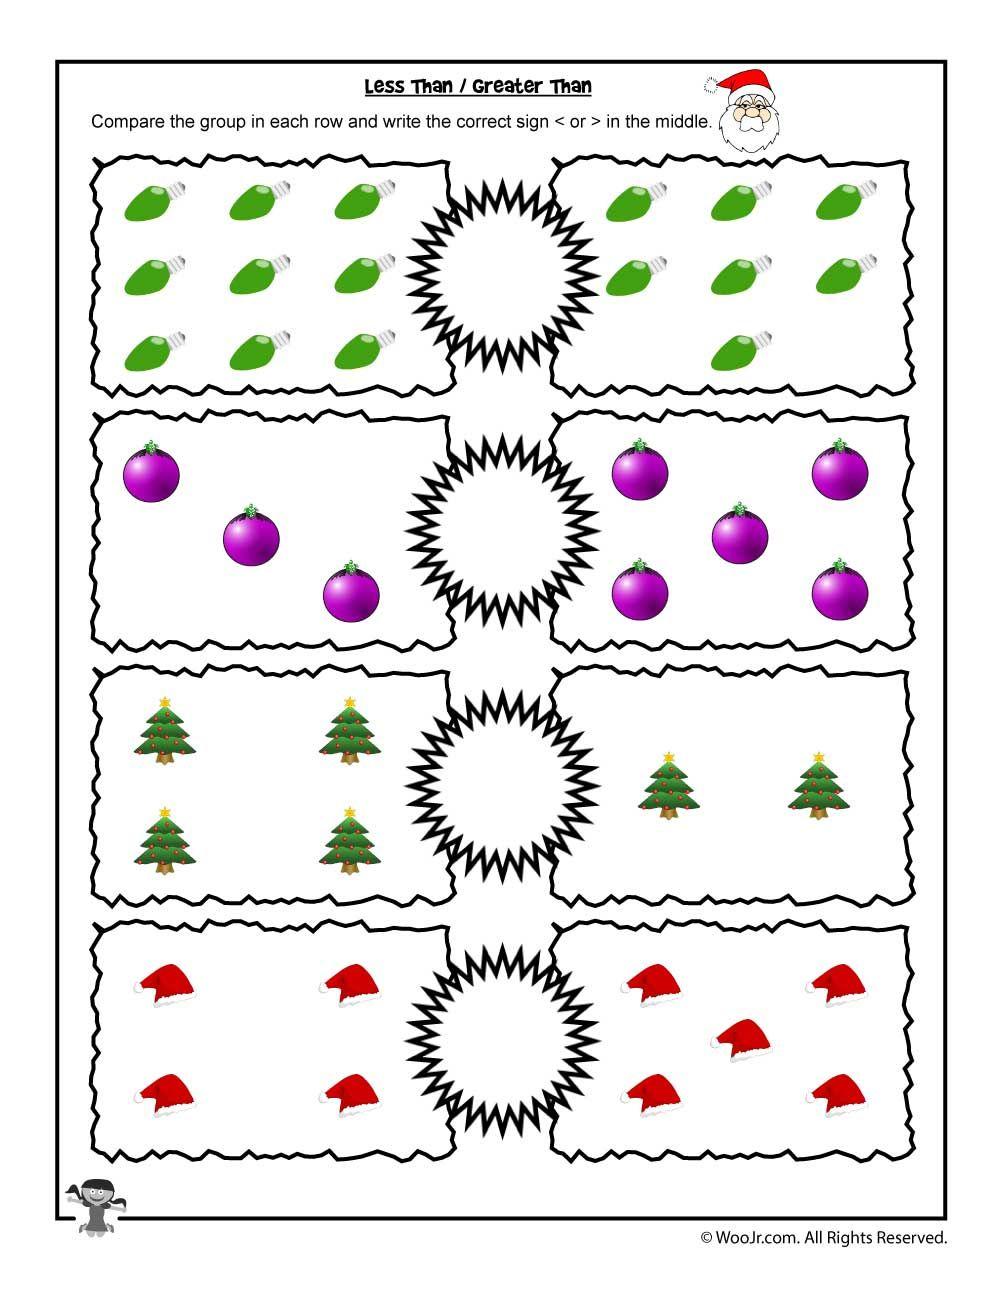 Easy 1 10 Greater Than Less Than Worksheet Woo Jr Kids Activities Thanksgiving Math Worksheets Kindergarten Math Worksheets Addition Christmas Math Worksheets